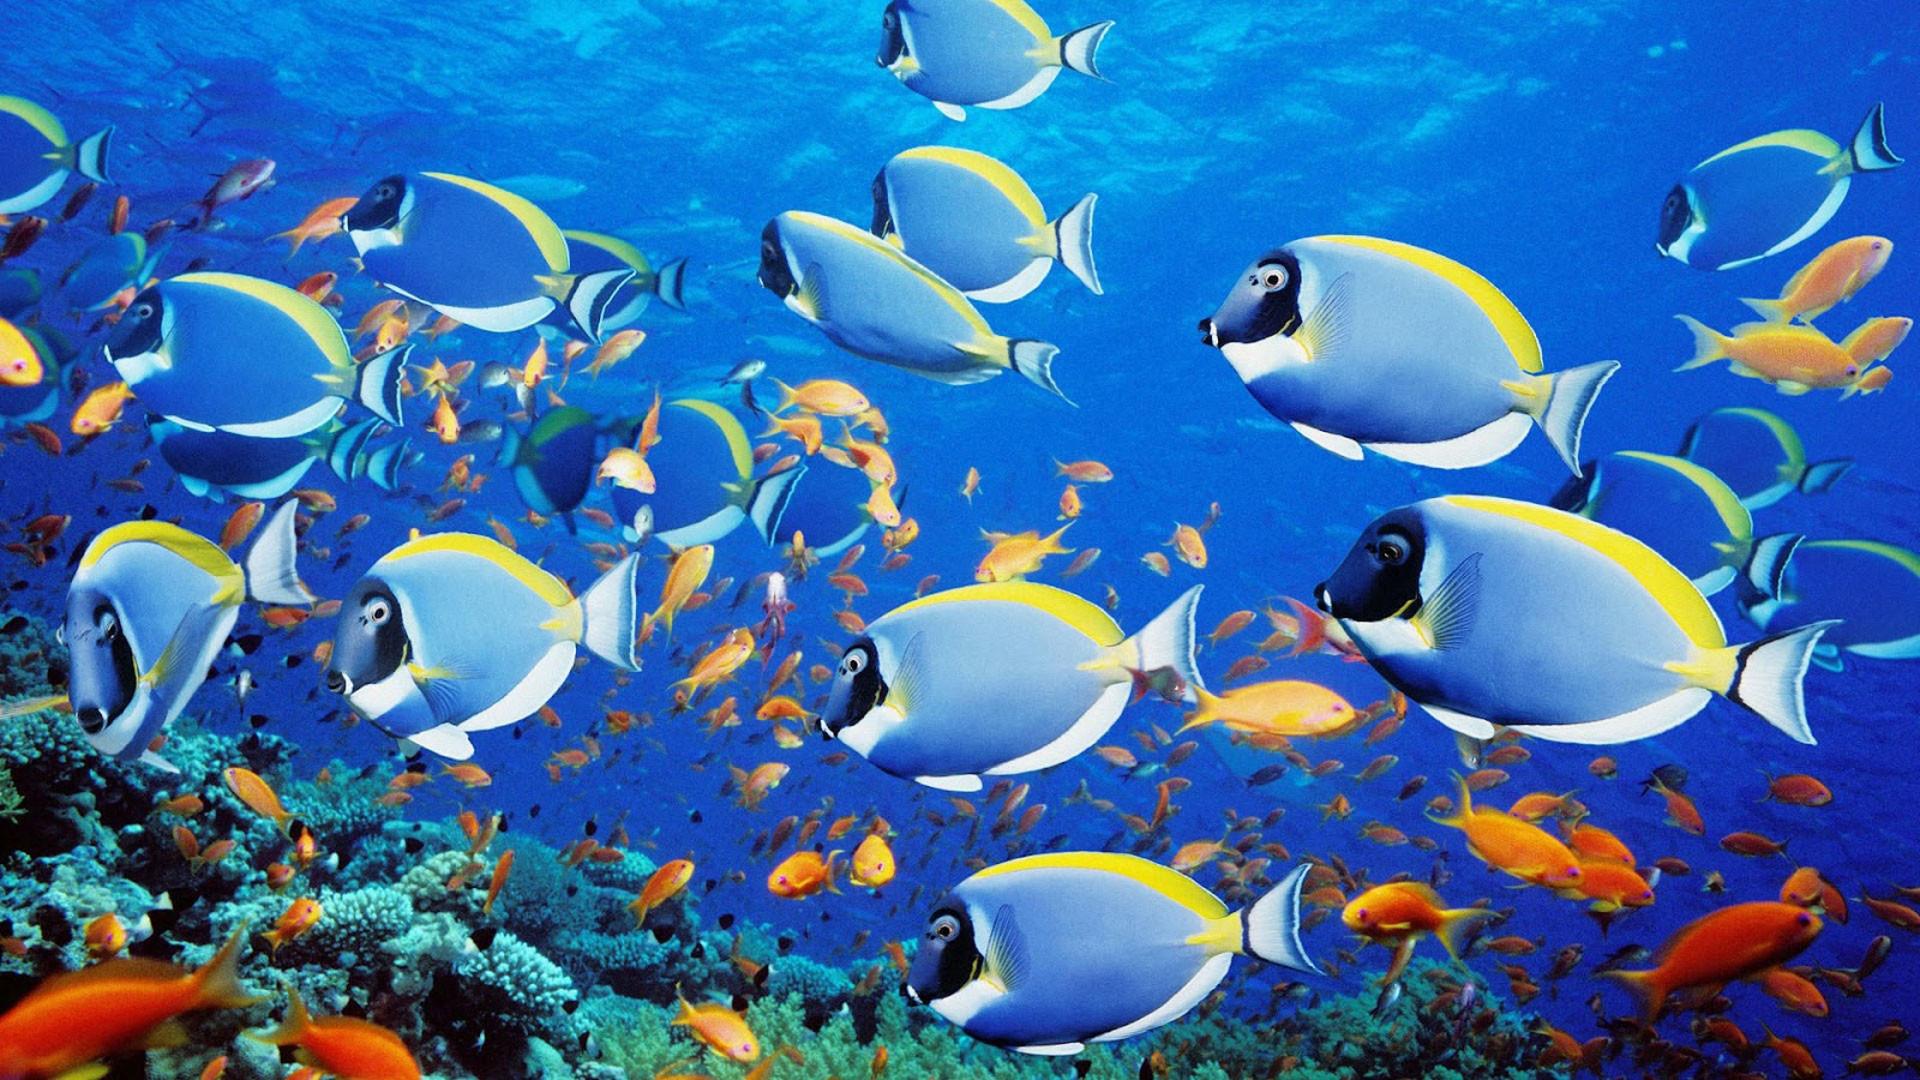 1920x1200 Sea Seabed Landscape Underwater Ocean Fish Wallpapers